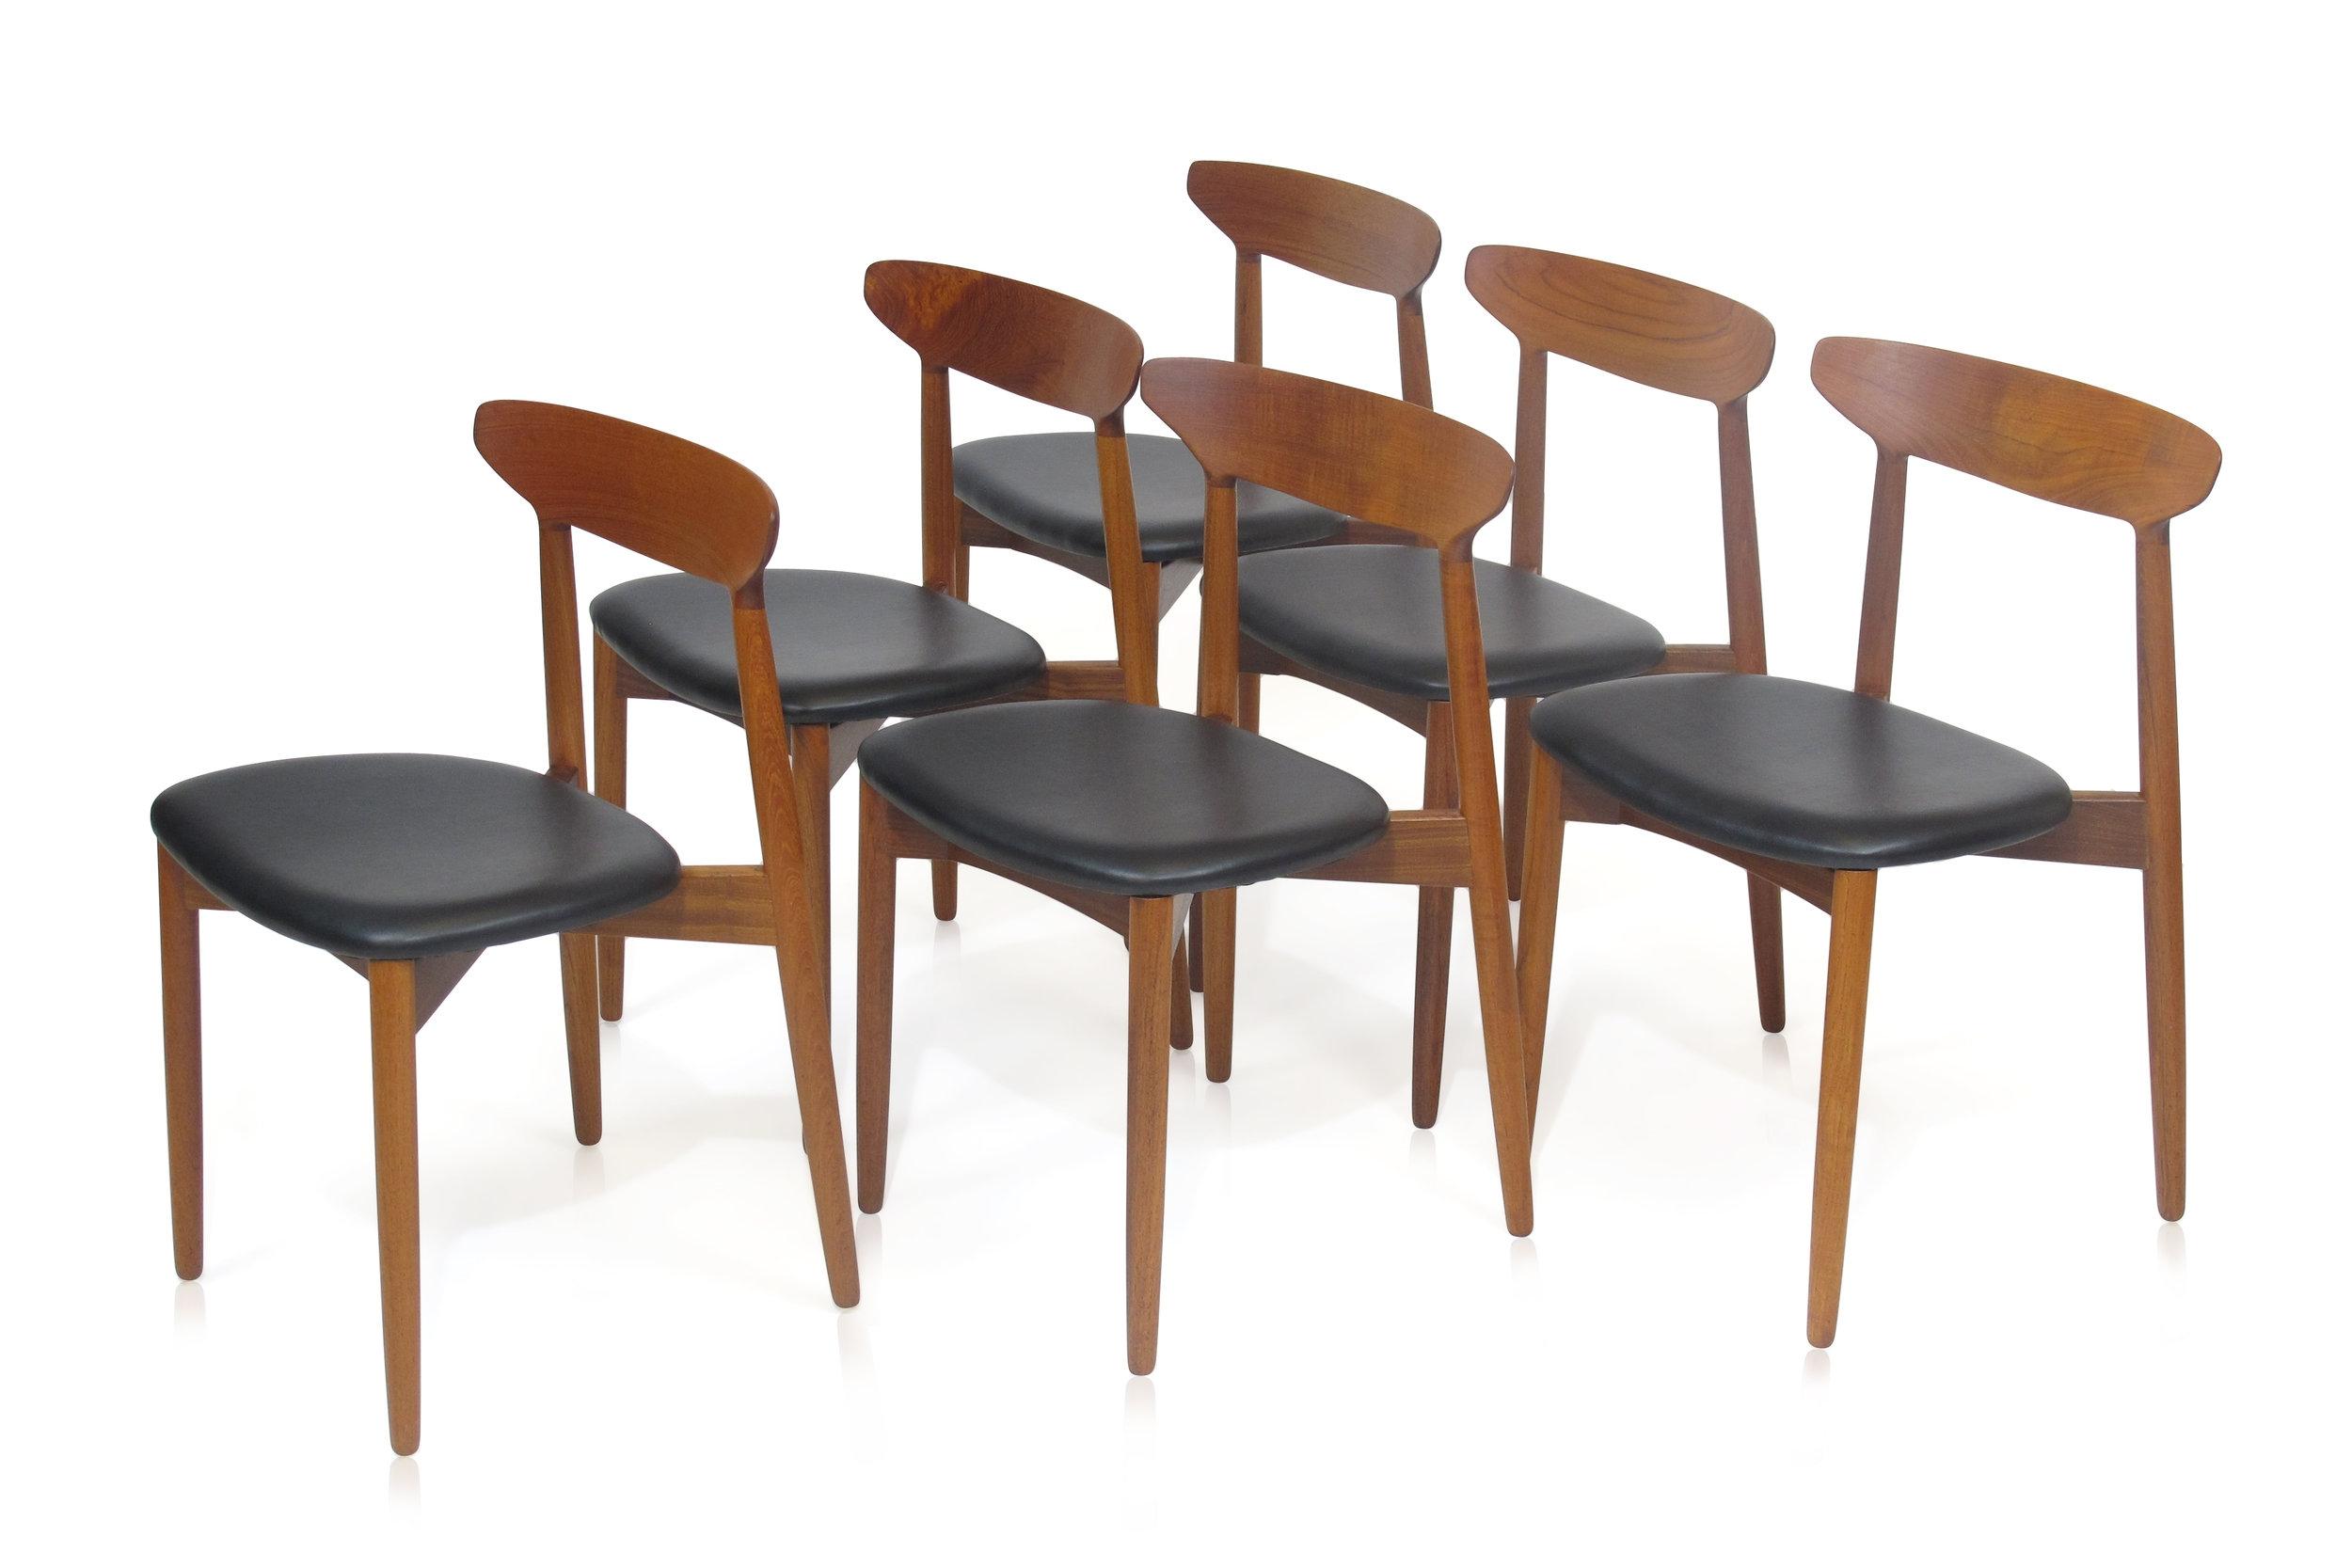 Harry Ostergaard Teak Dining Chairs